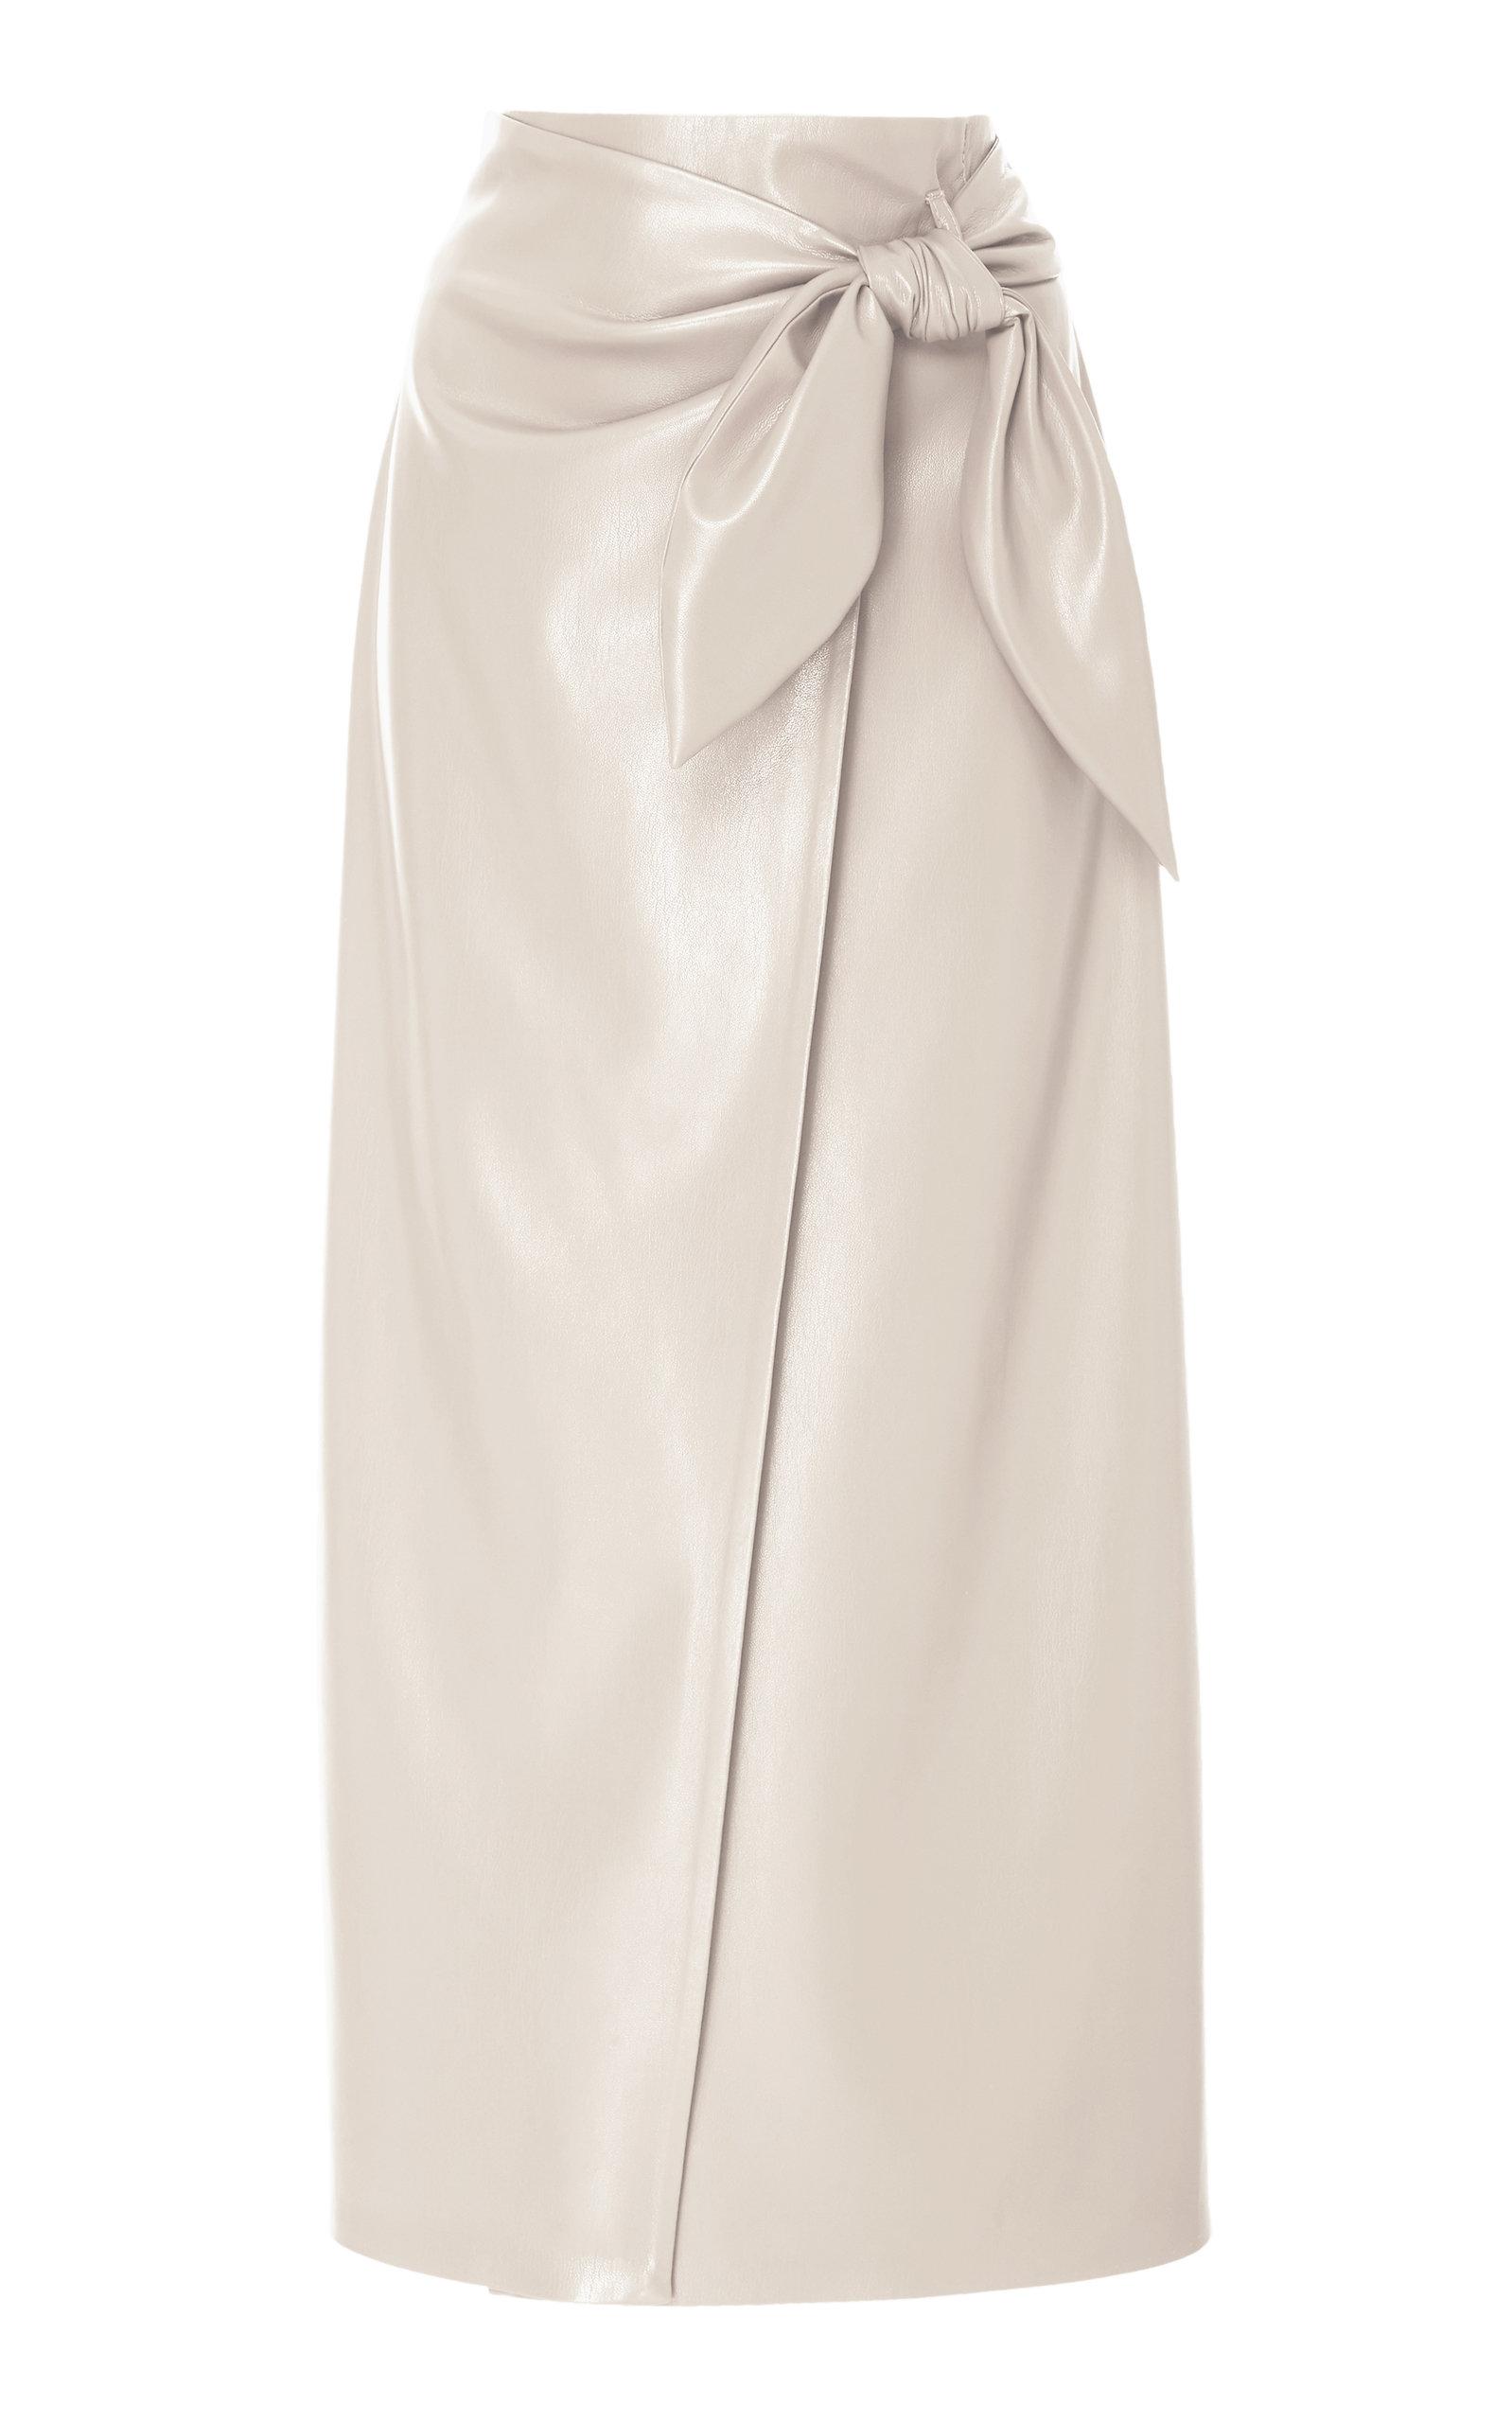 411e400cc5f9 Nanushka Amas Tie Front Vegan Leather Midi Skirt In White